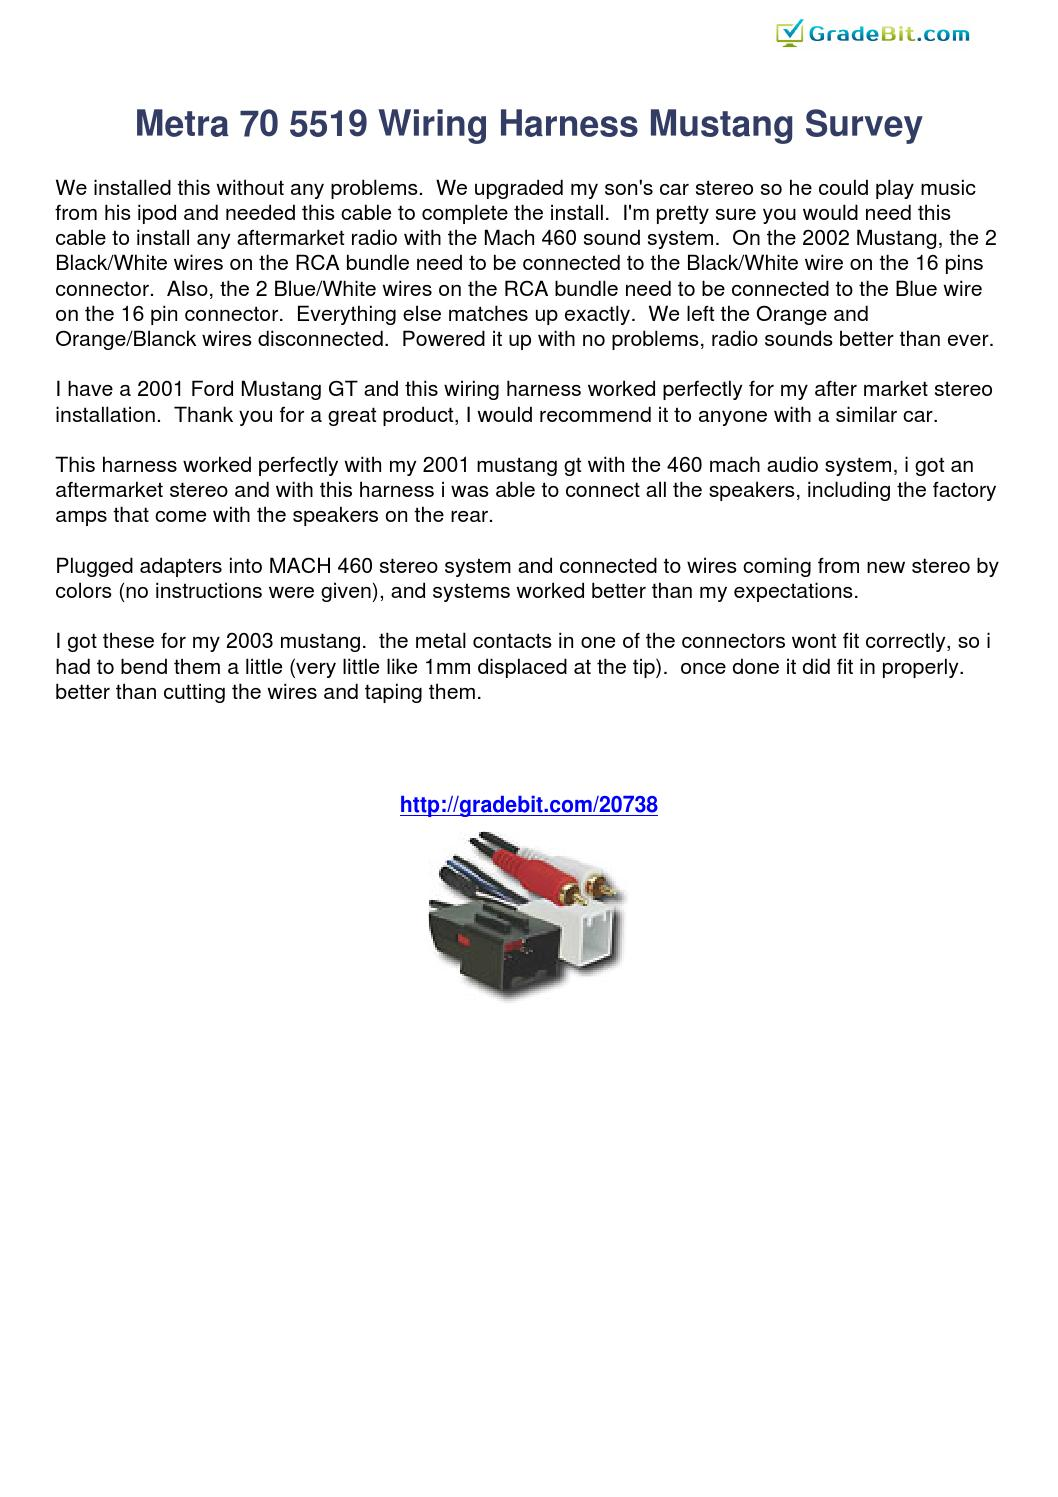 metra 70 5519 wiring harness mustang survey 20738 by klacertio issuu